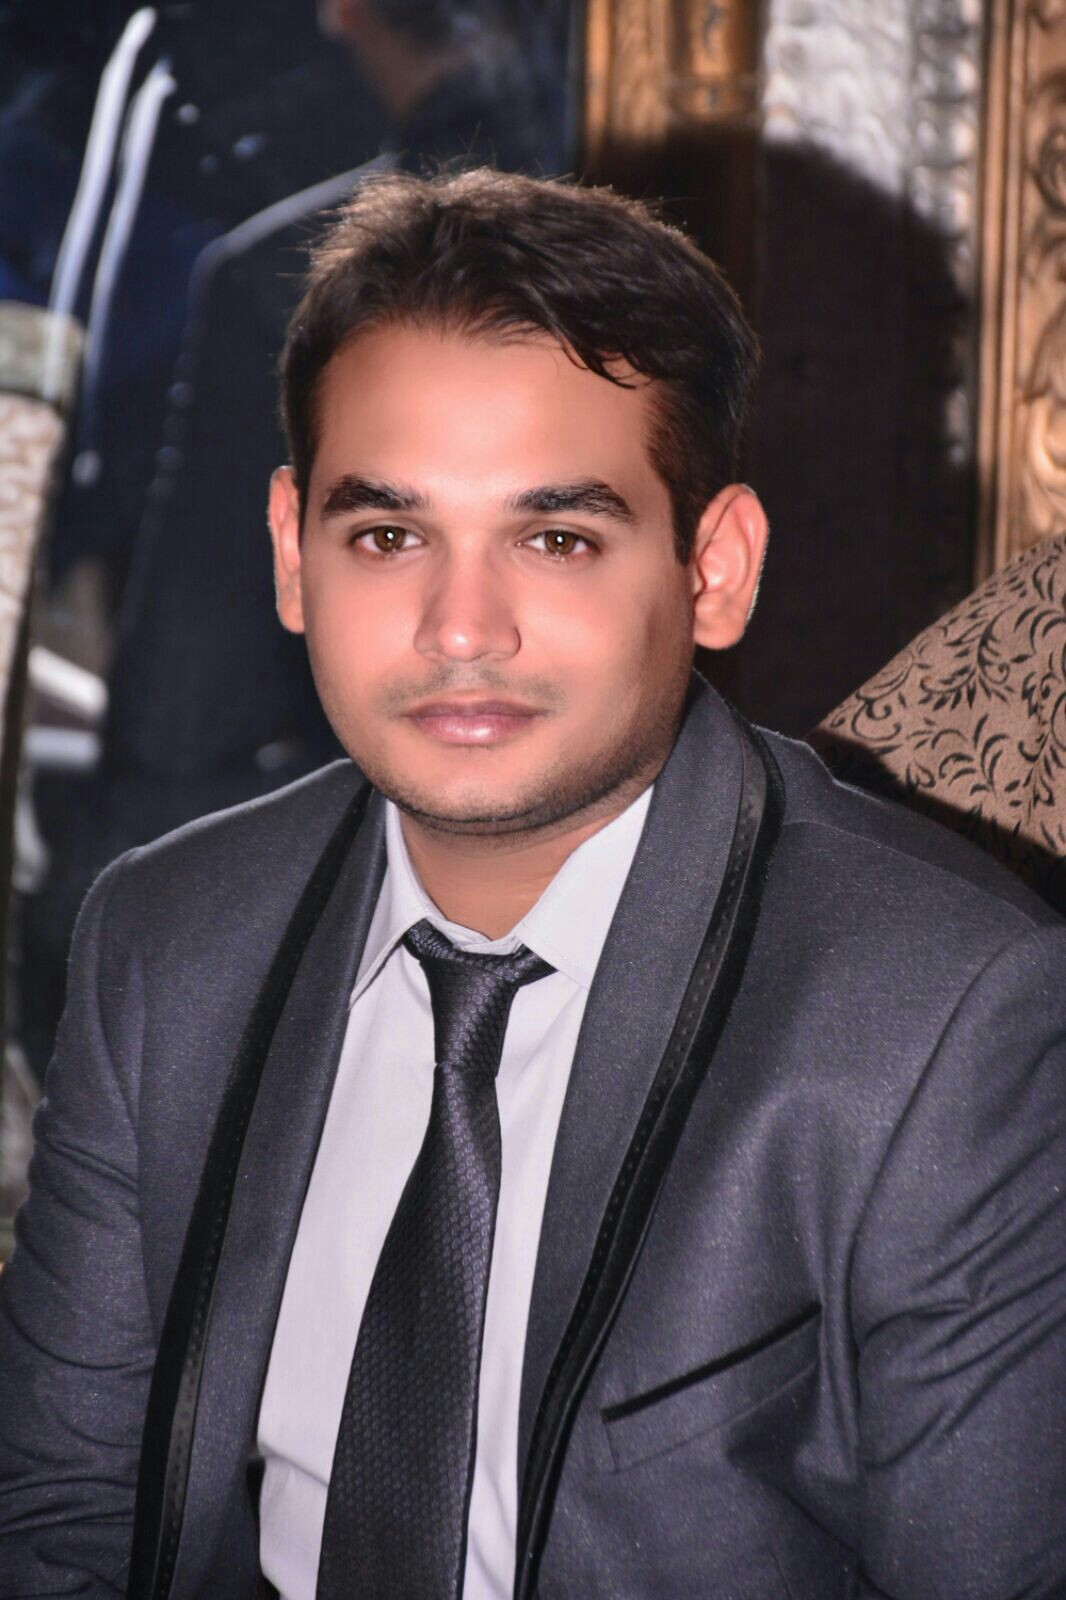 Nawaz Mustafa Electrical Engineering, Engineering Drawing, Matlab & Mathematica, Machine Learning, Java